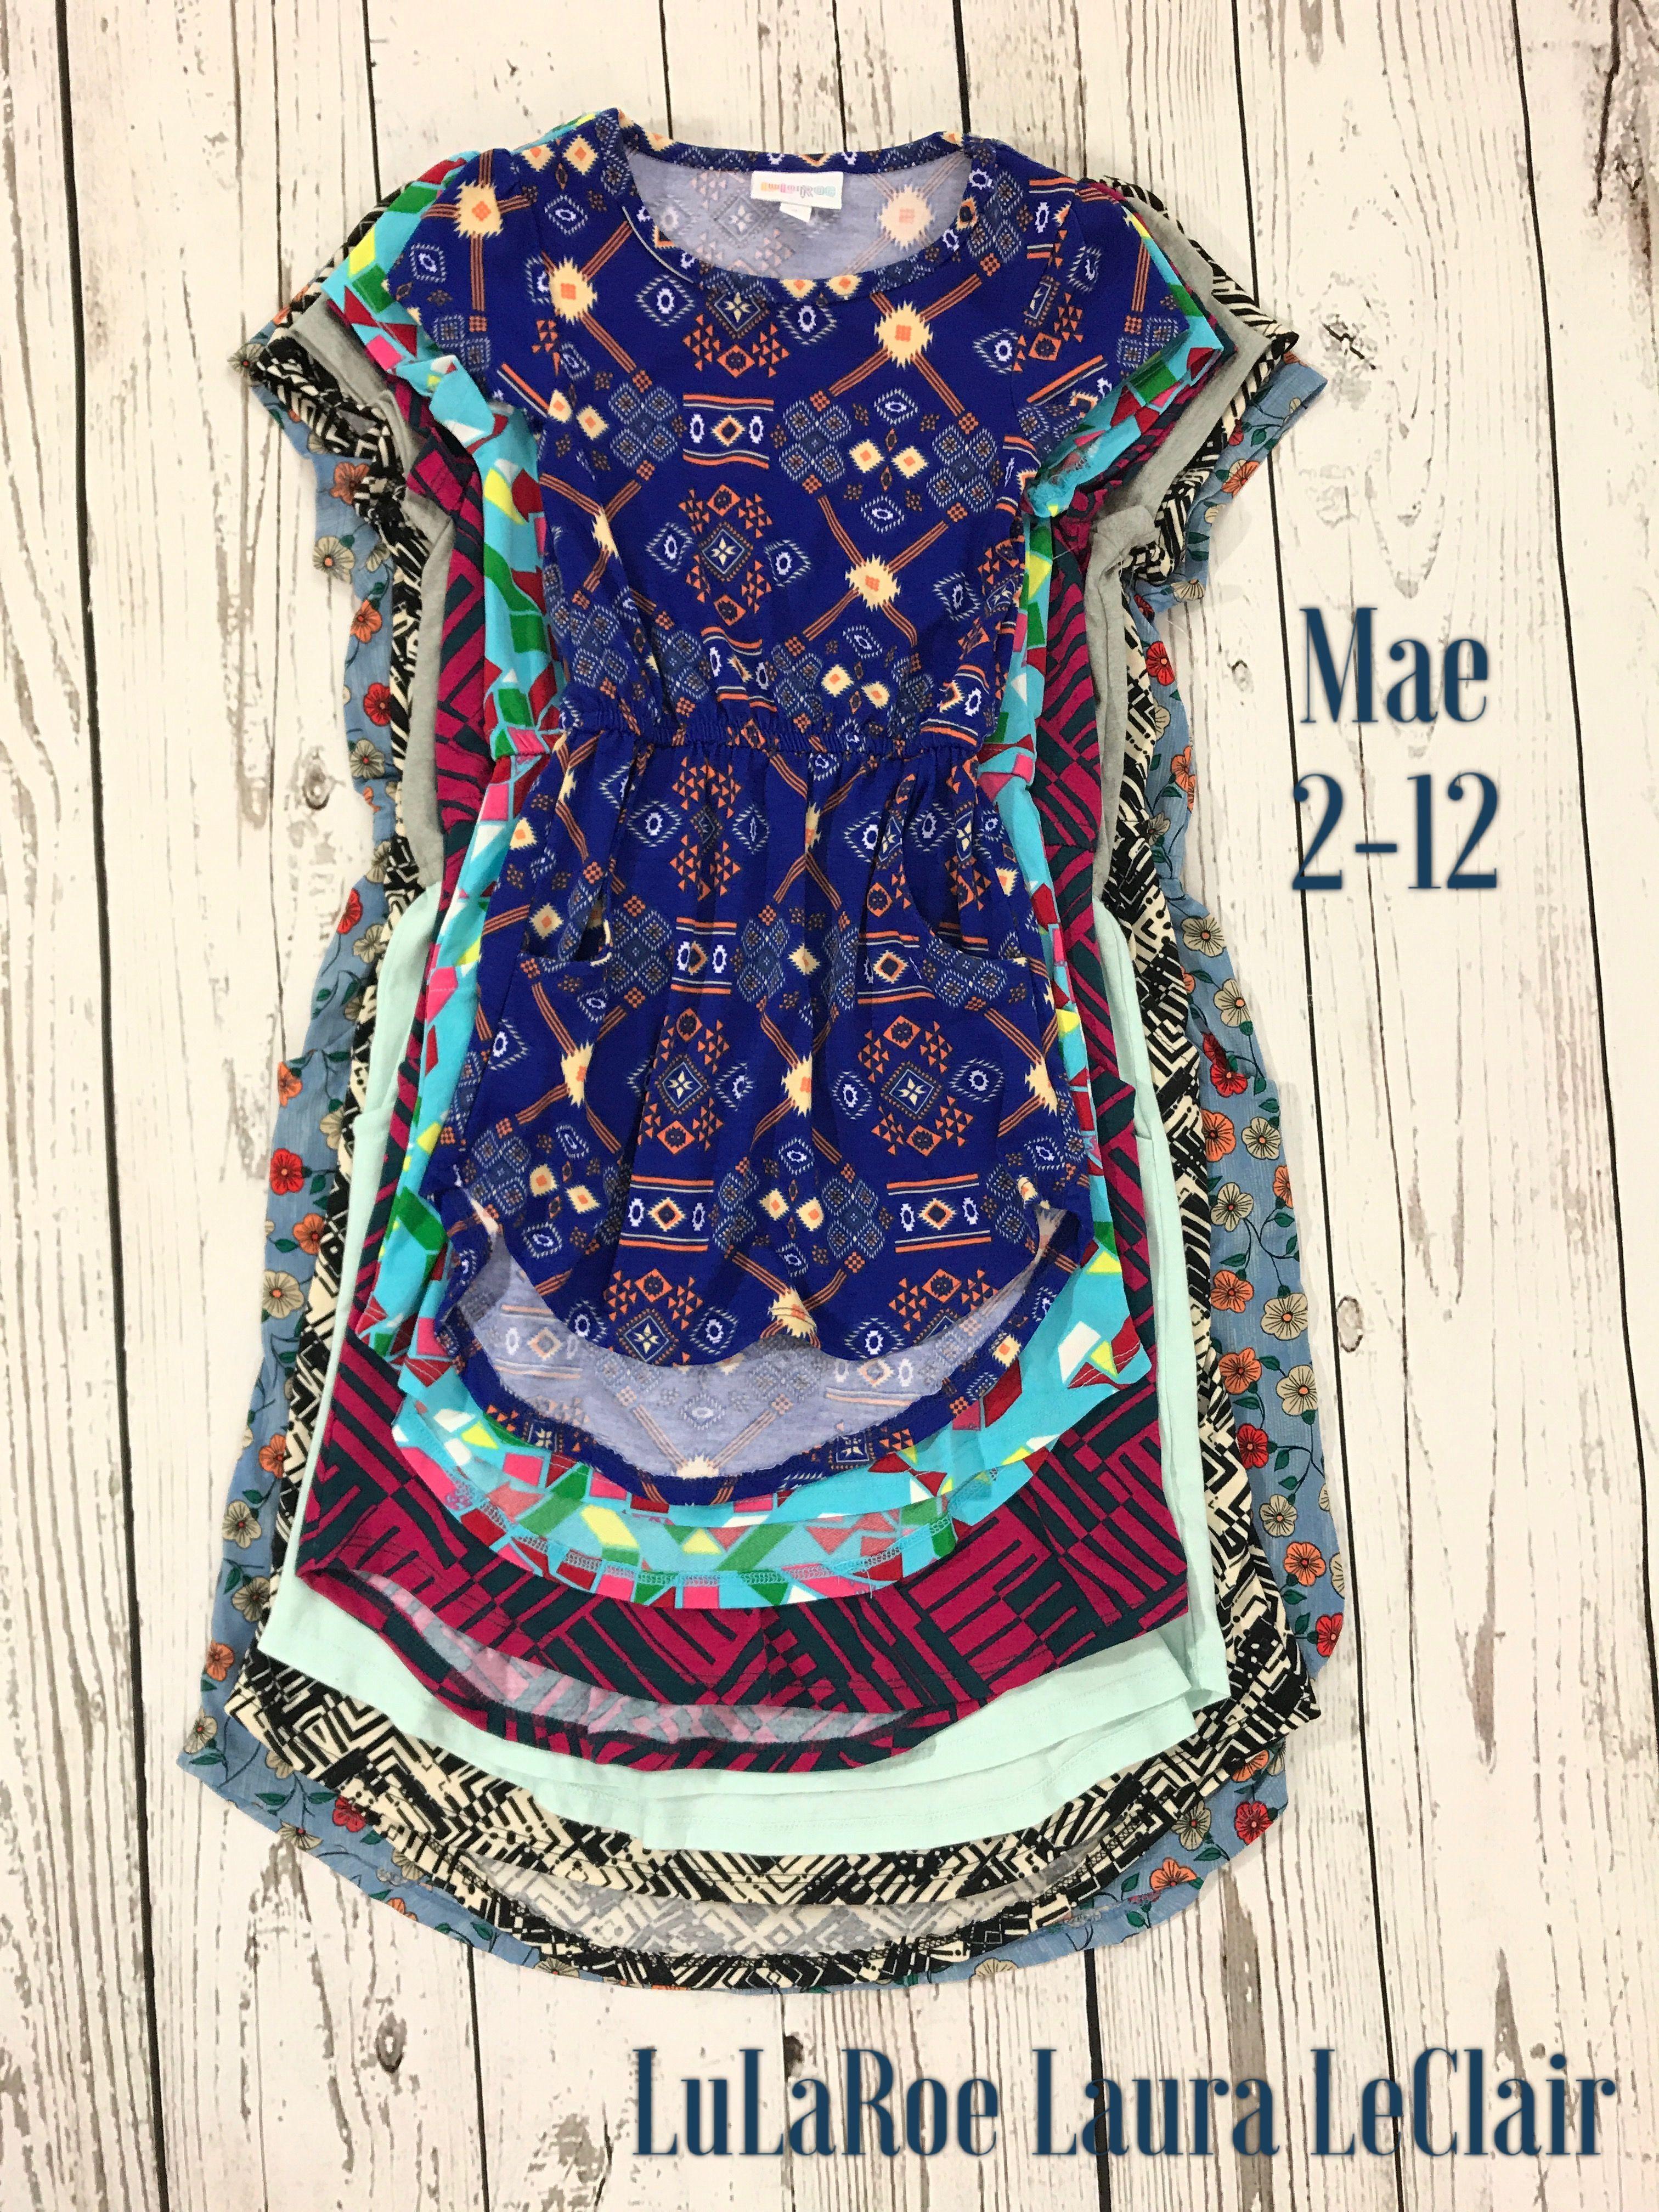 ec15f1151e0 LuLaRoe kids Mae dress sizes 2-12 size comparisons